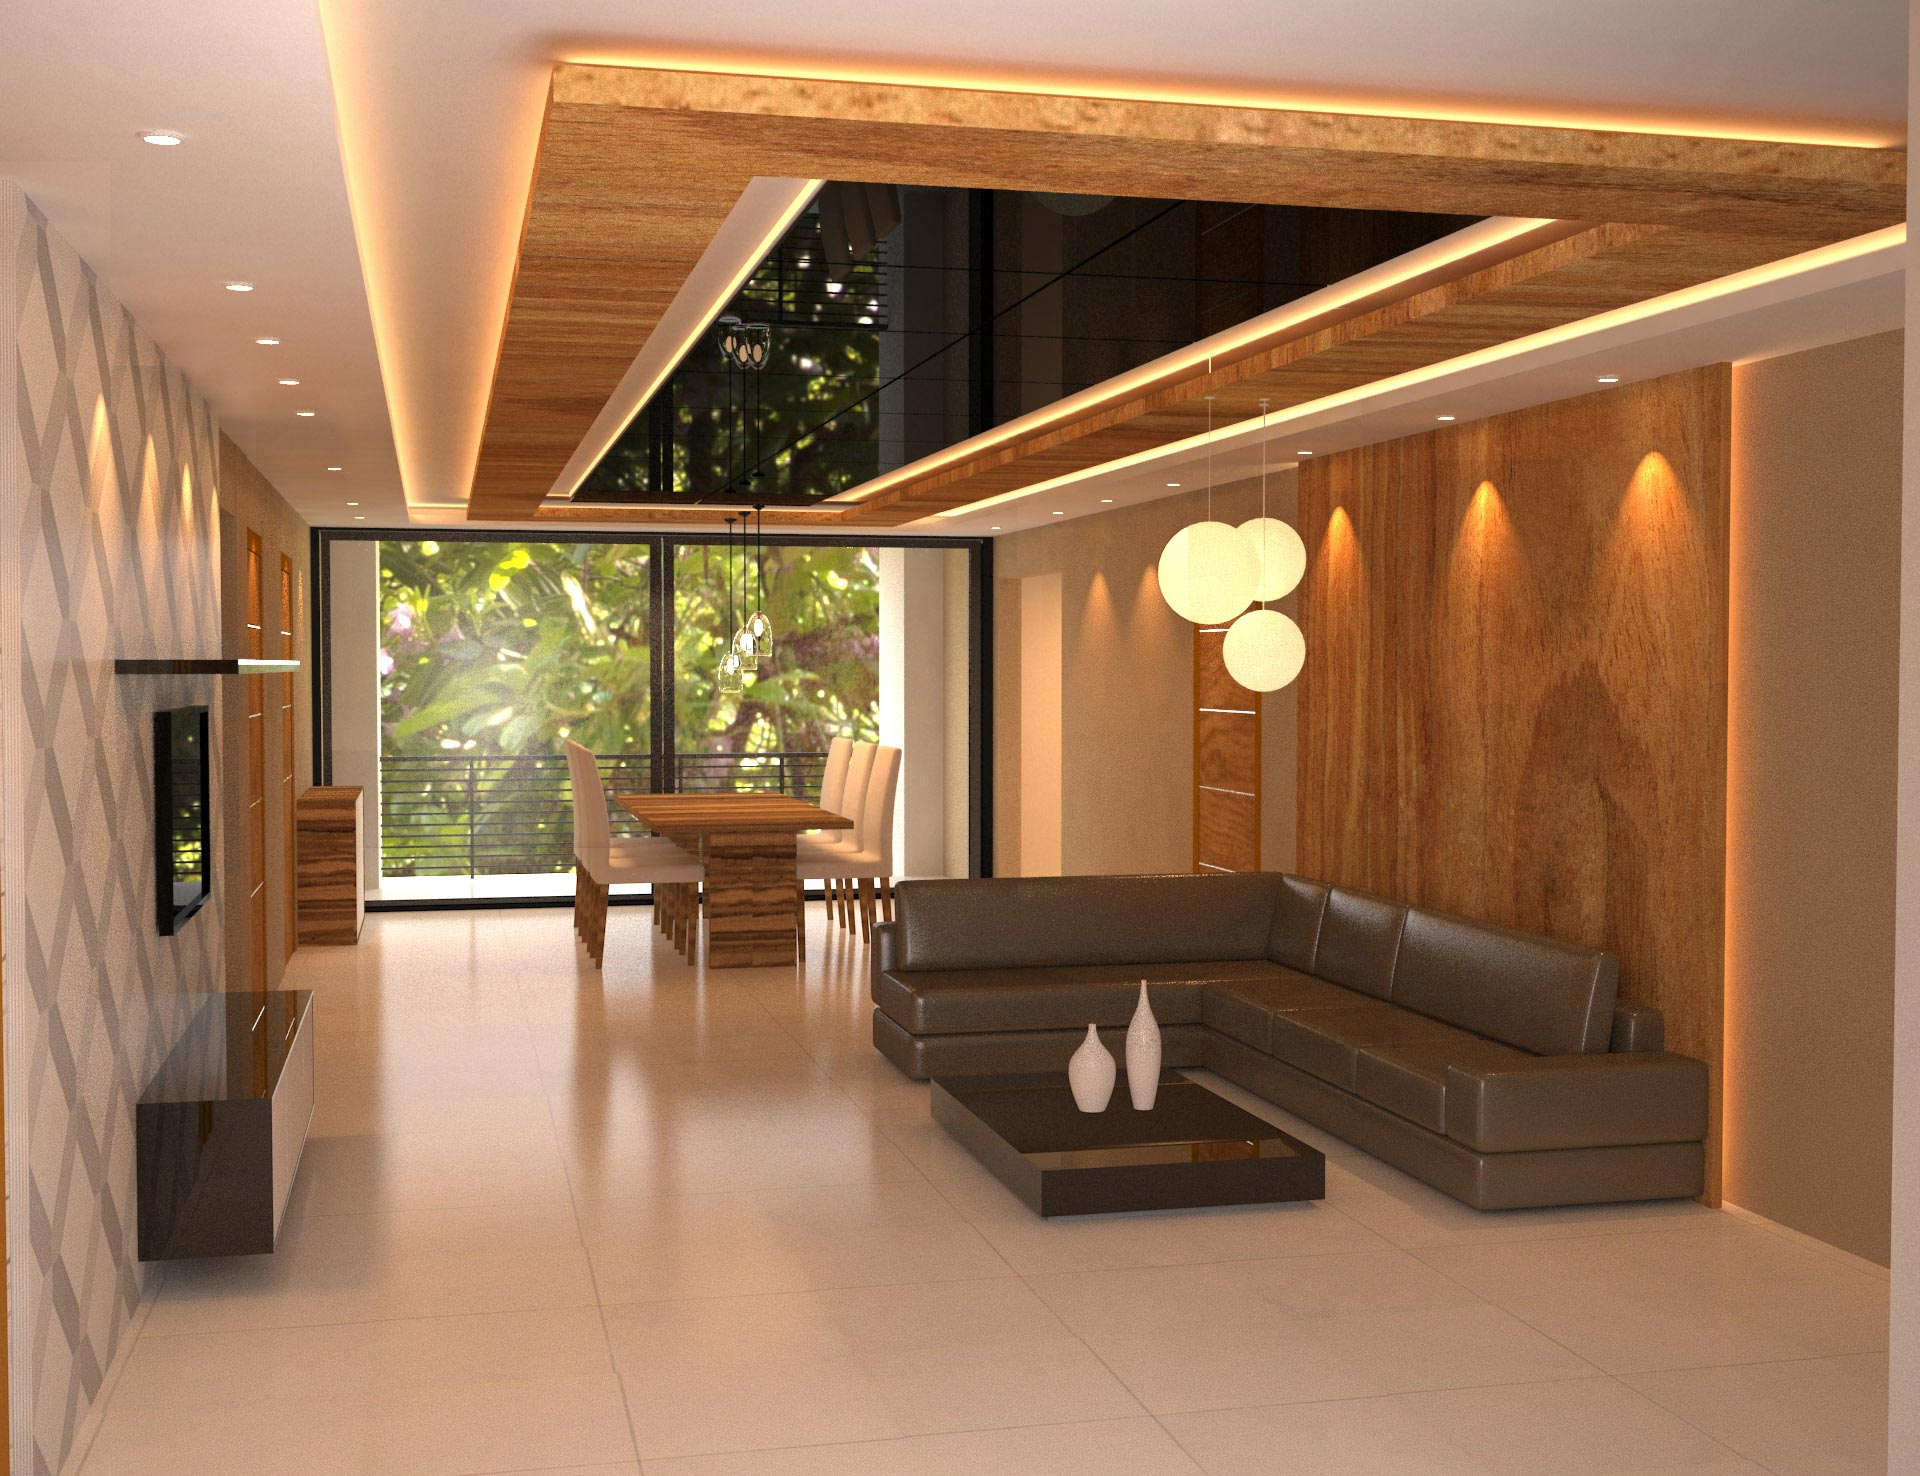 Interior design room architecture wallpaper 1920x1476 for Largest interior design firms